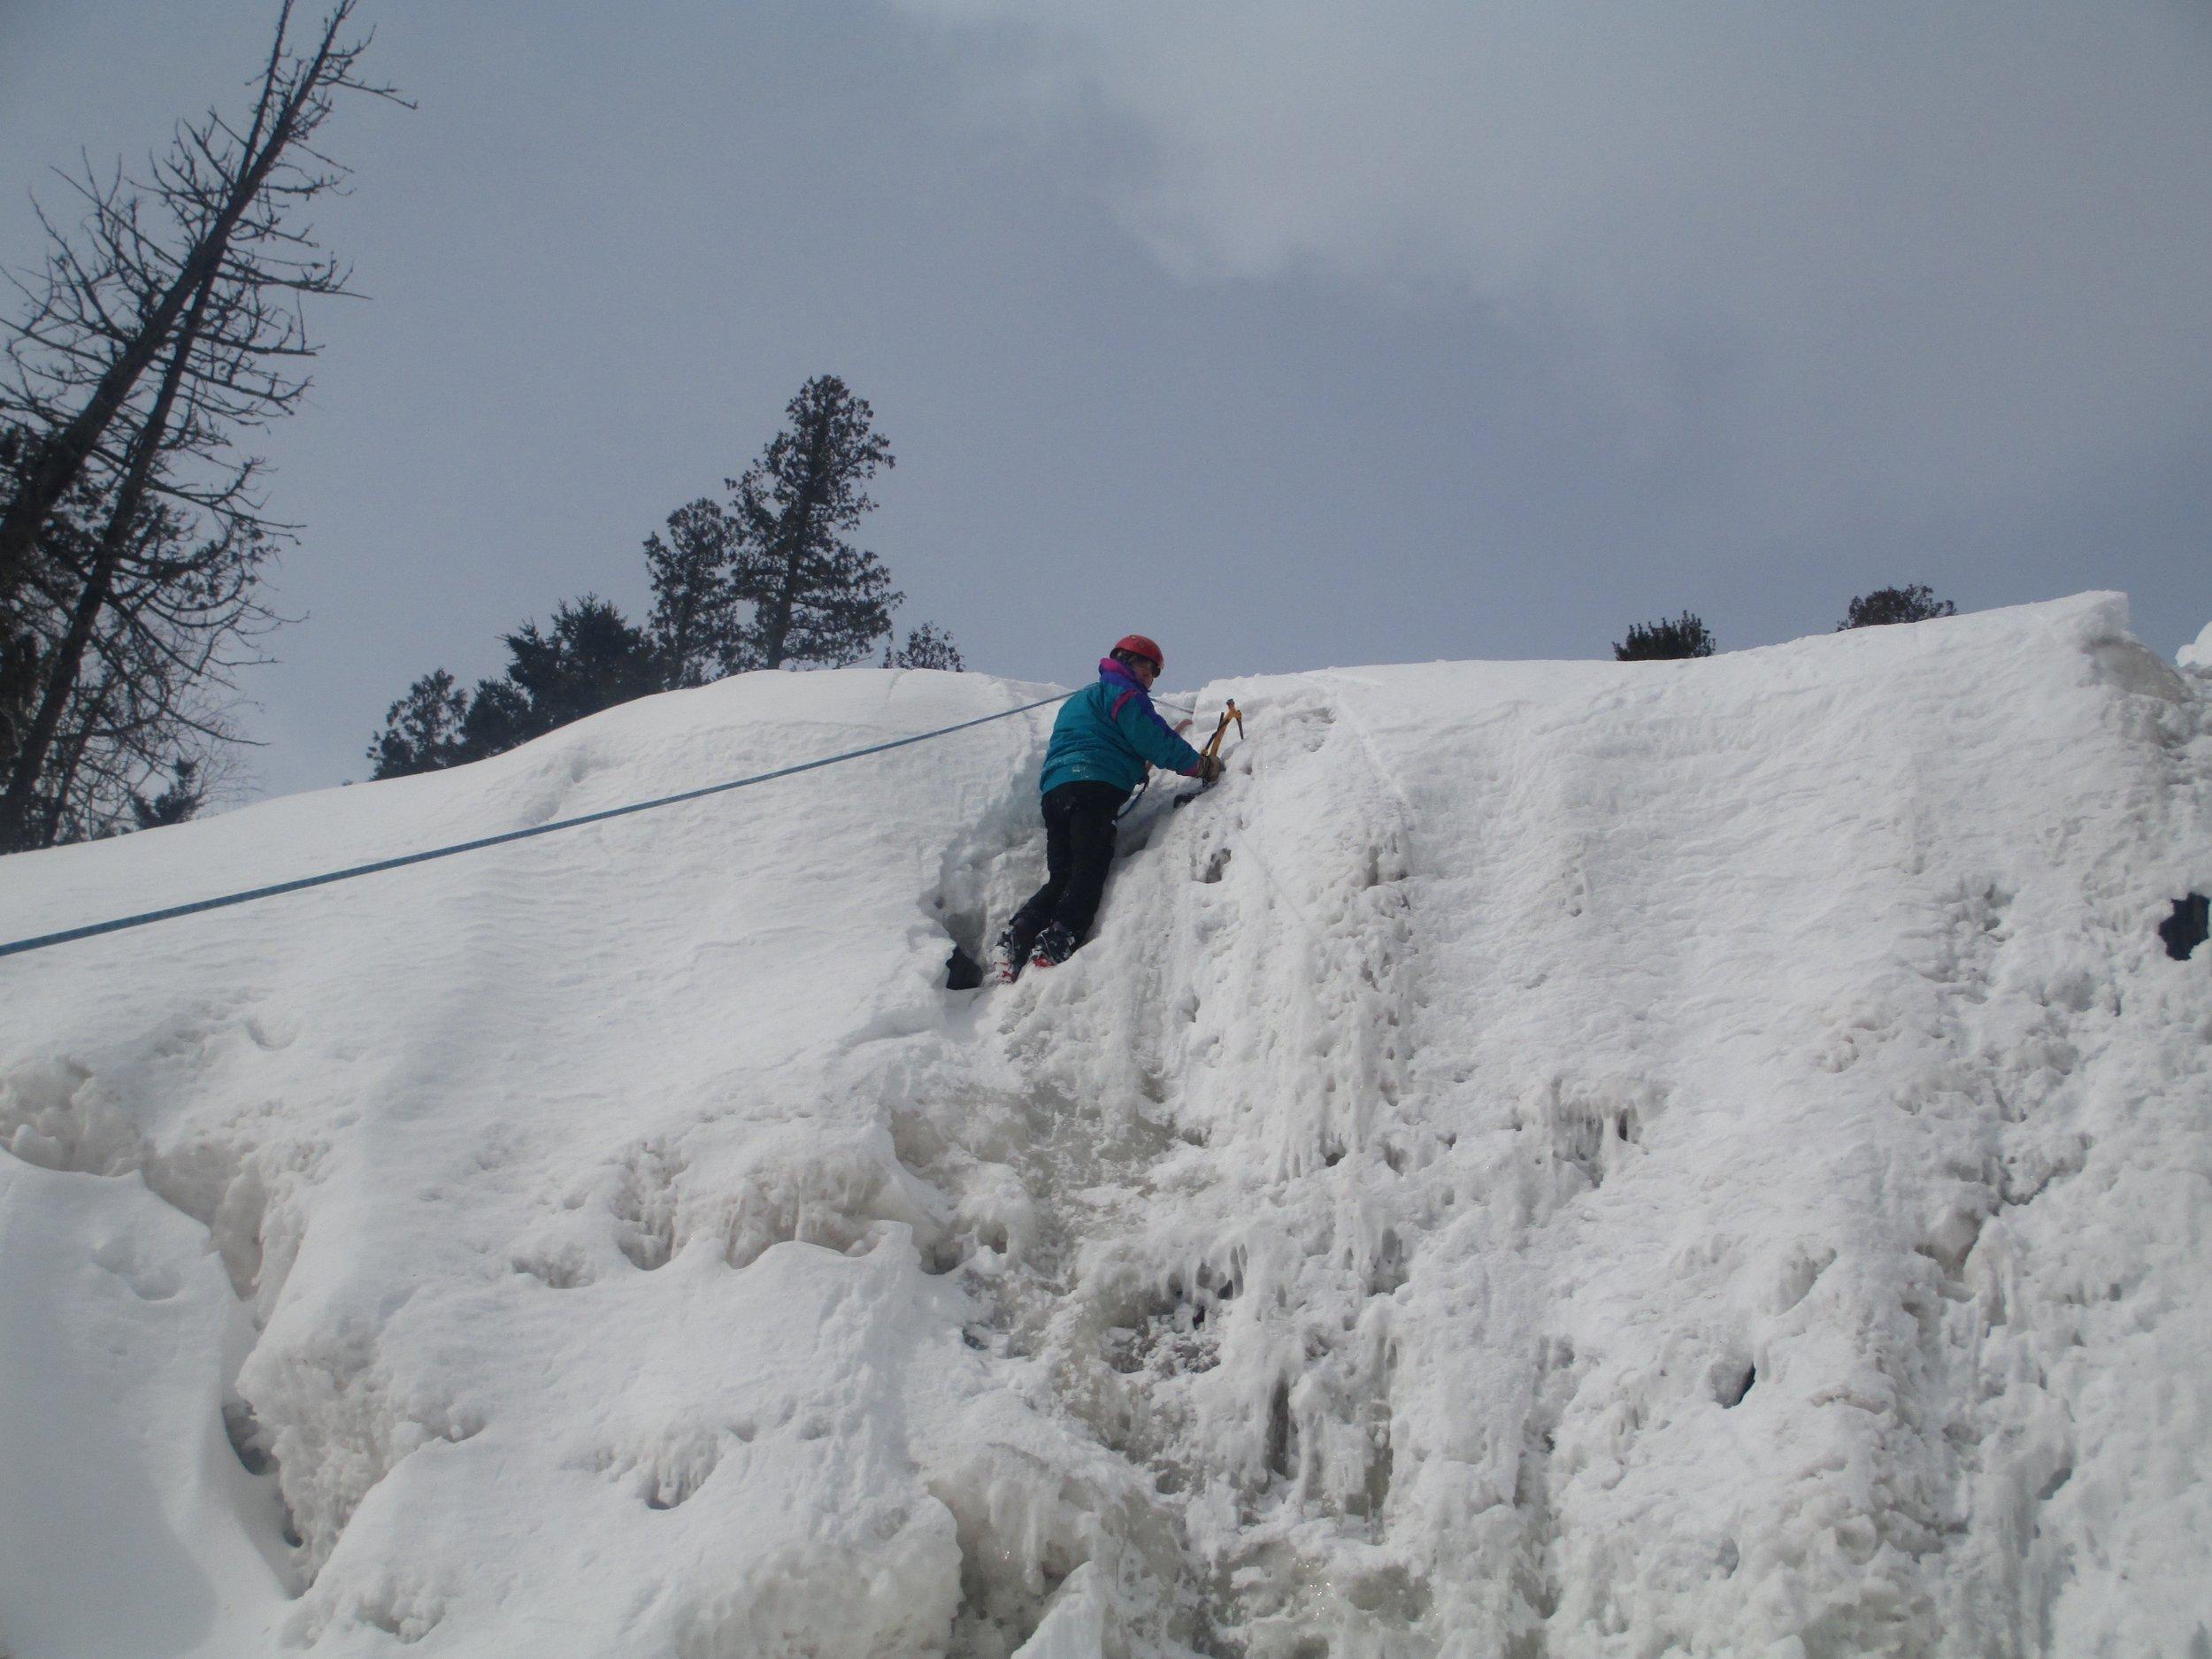 ice-climbing-reaching-the-top